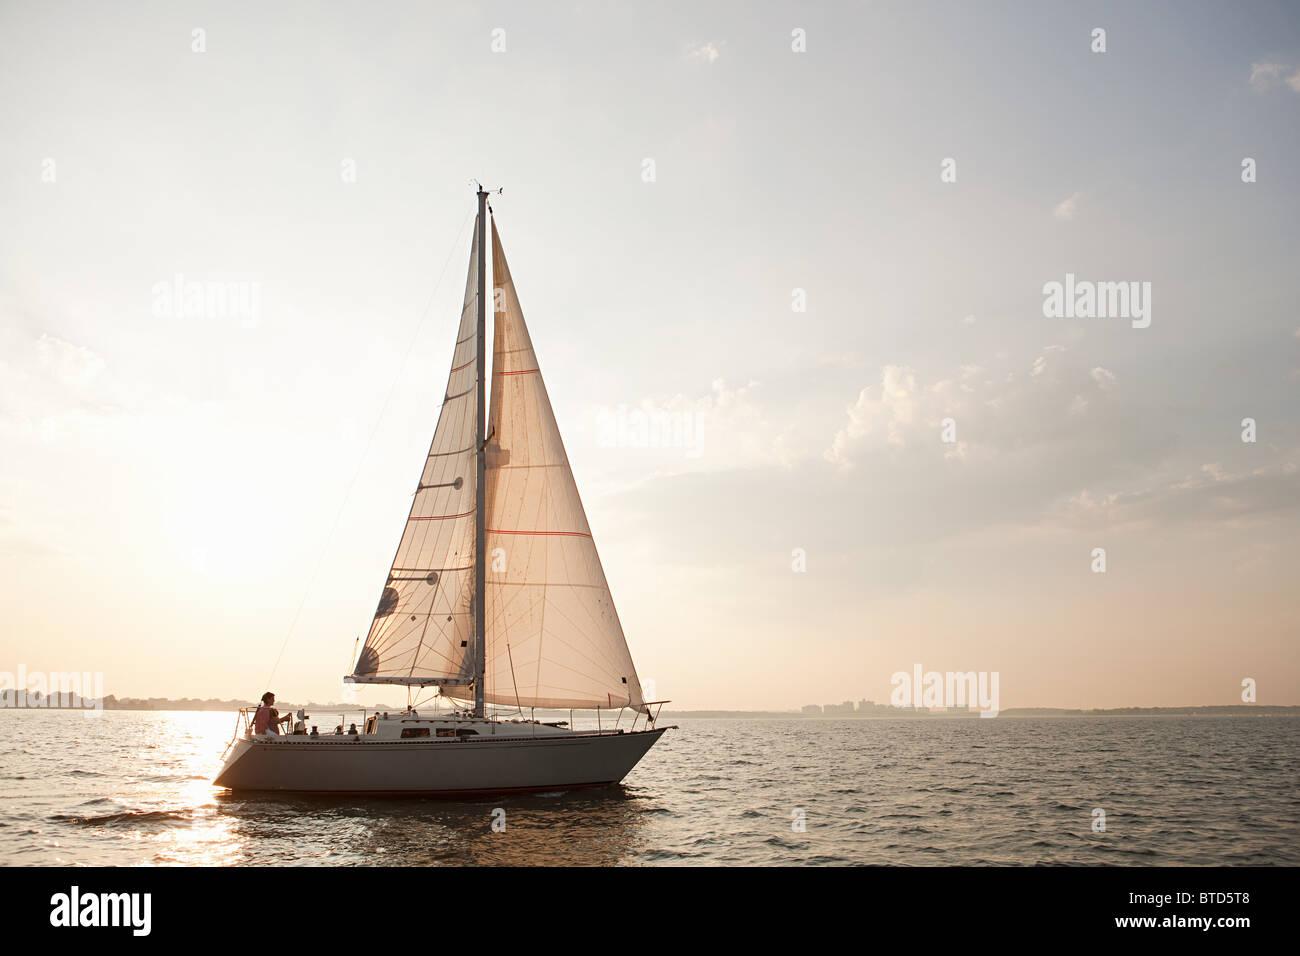 Yacht sailing on sea - Stock Image